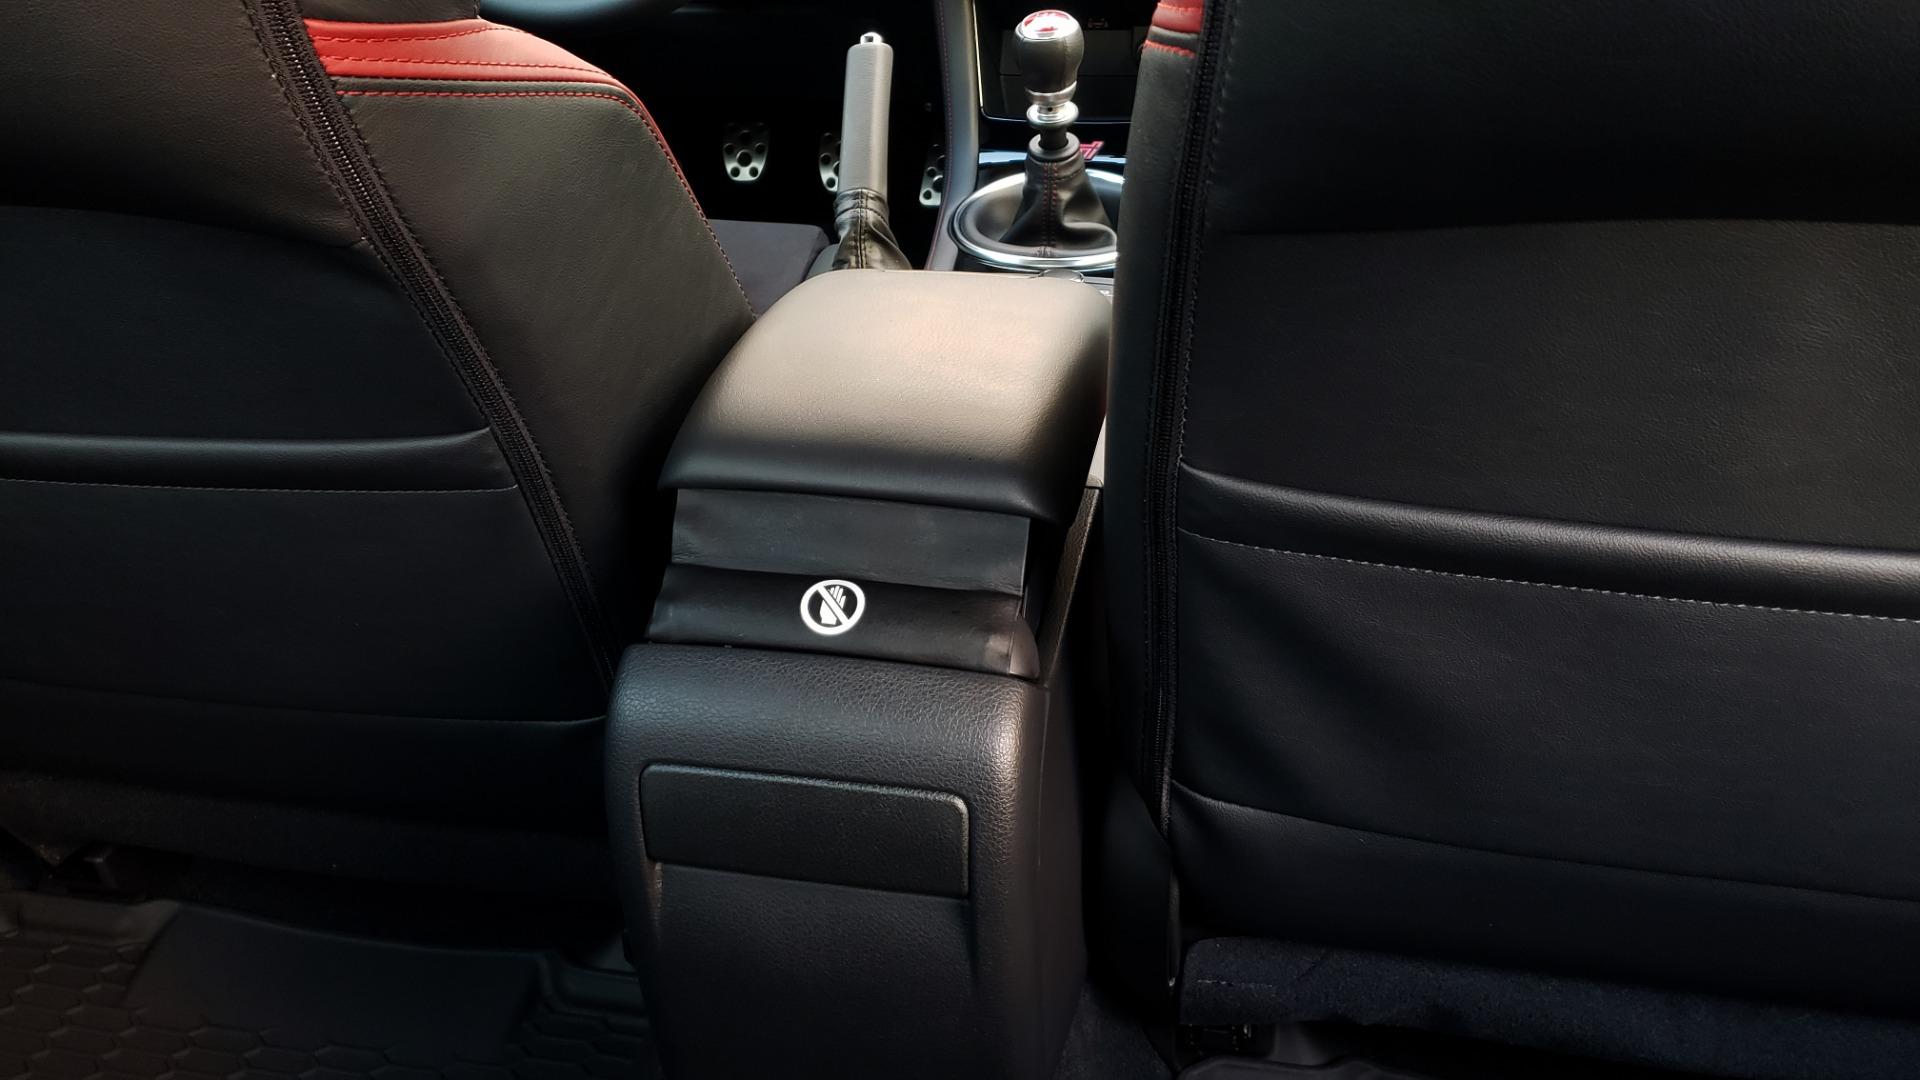 Used 2020 Subaru WRX STI 2.5L TURBO / 6-SPEED MANUAL / RECARO SEATS / REARVIEW for sale Sold at Formula Imports in Charlotte NC 28227 87